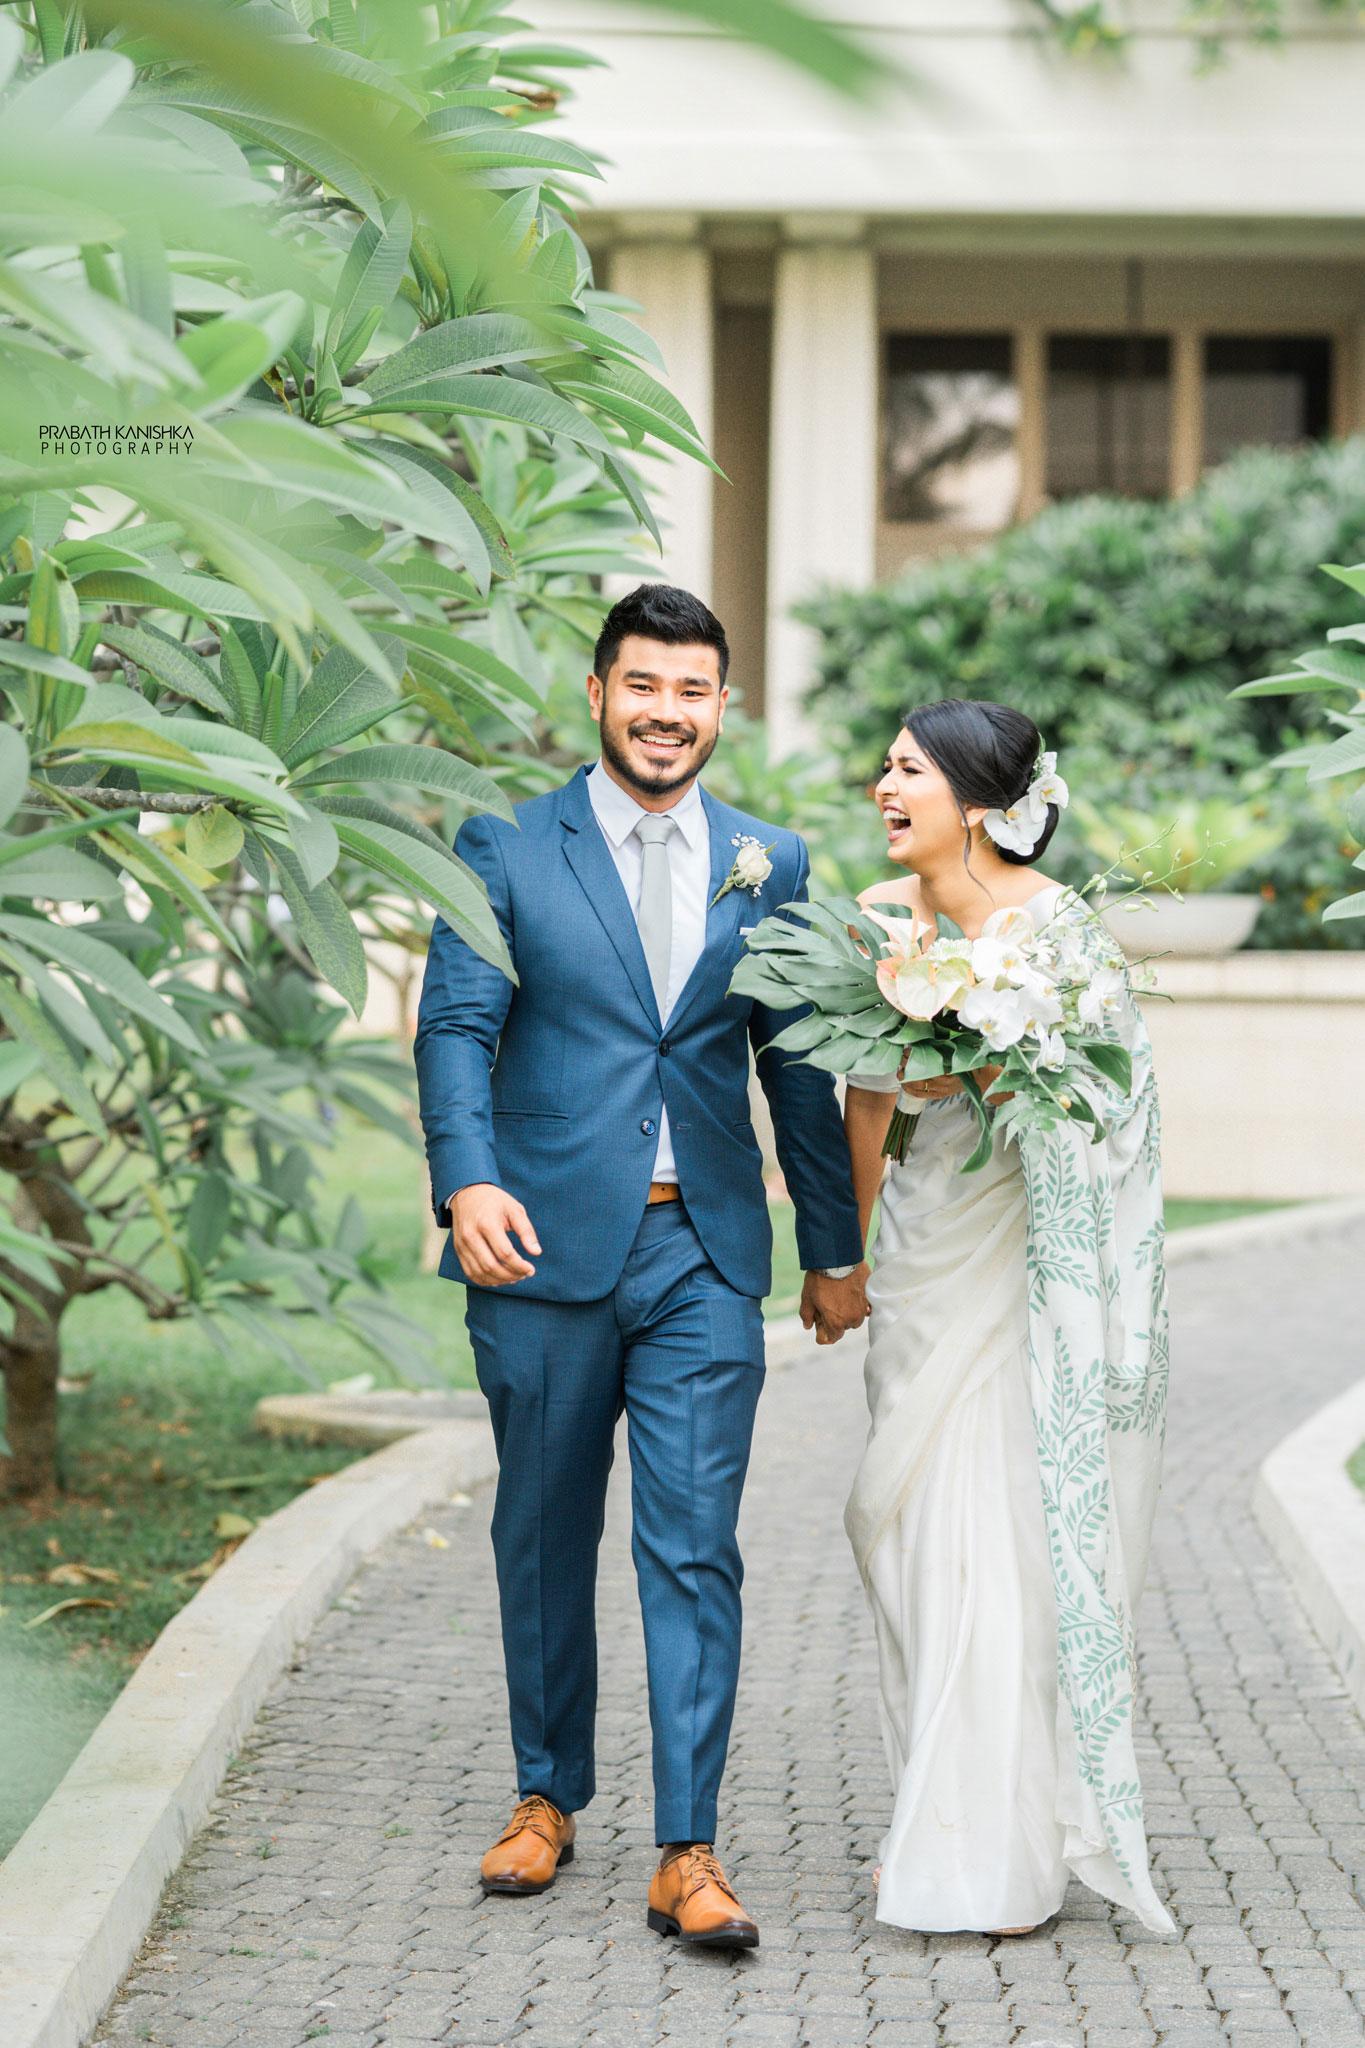 Nishadi & Haren - Prabath Kanishka Wedding Photography